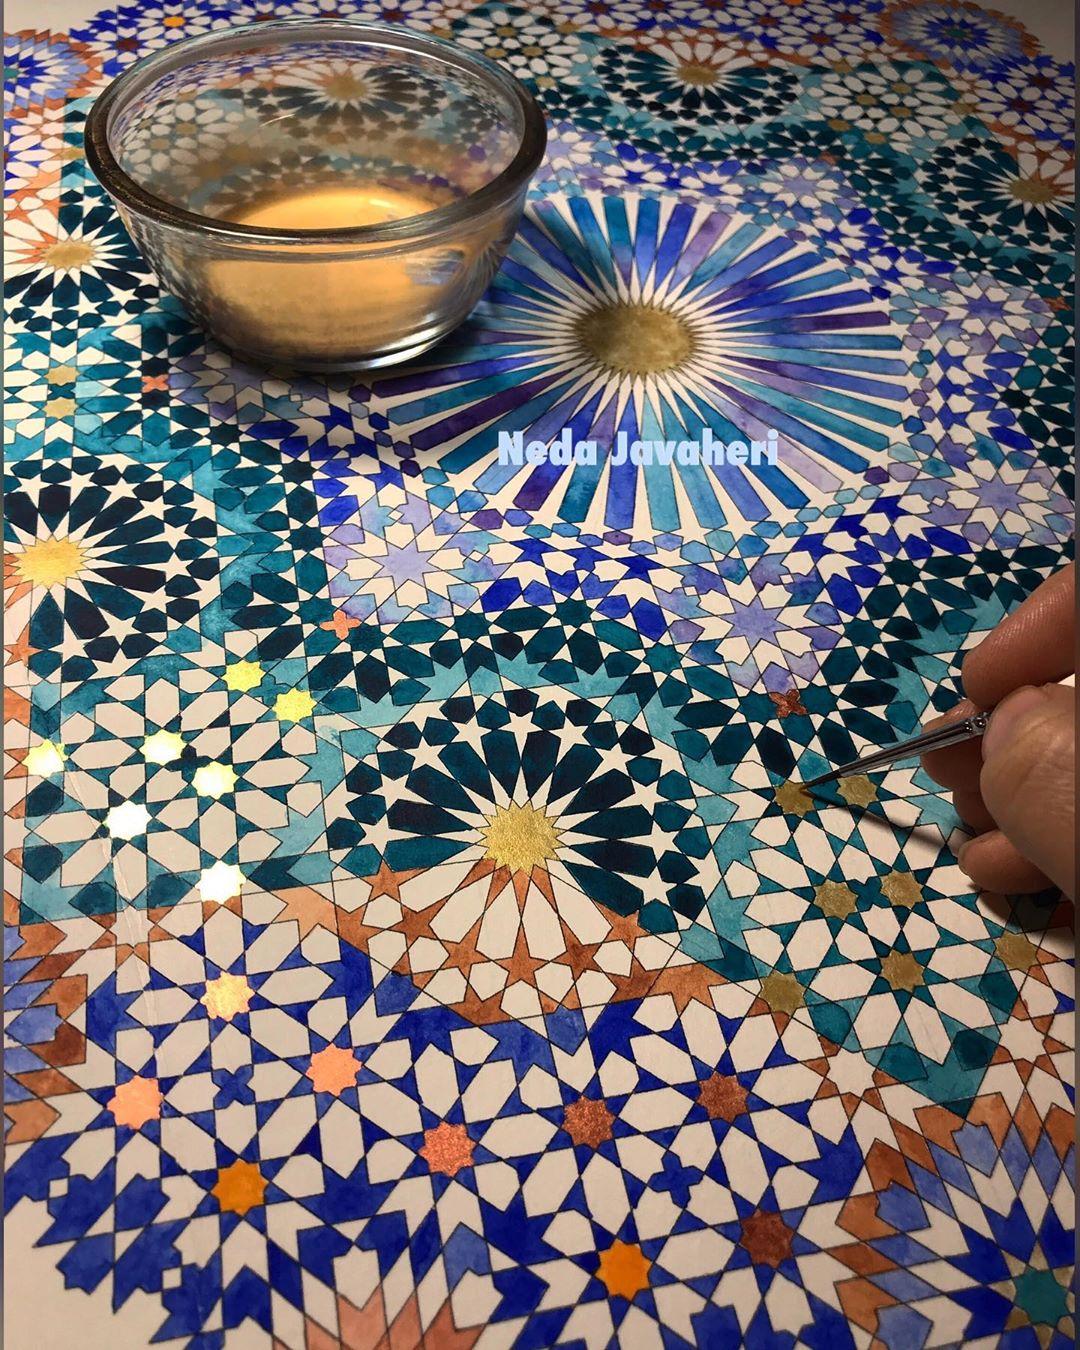 Karya Kaligrafi  عشقت هوای تازه ست، در این قفس که دارد هر دفعه  بوی تعلیق ، هر لحظه  رنگِ تکرار …- Ne Javaher